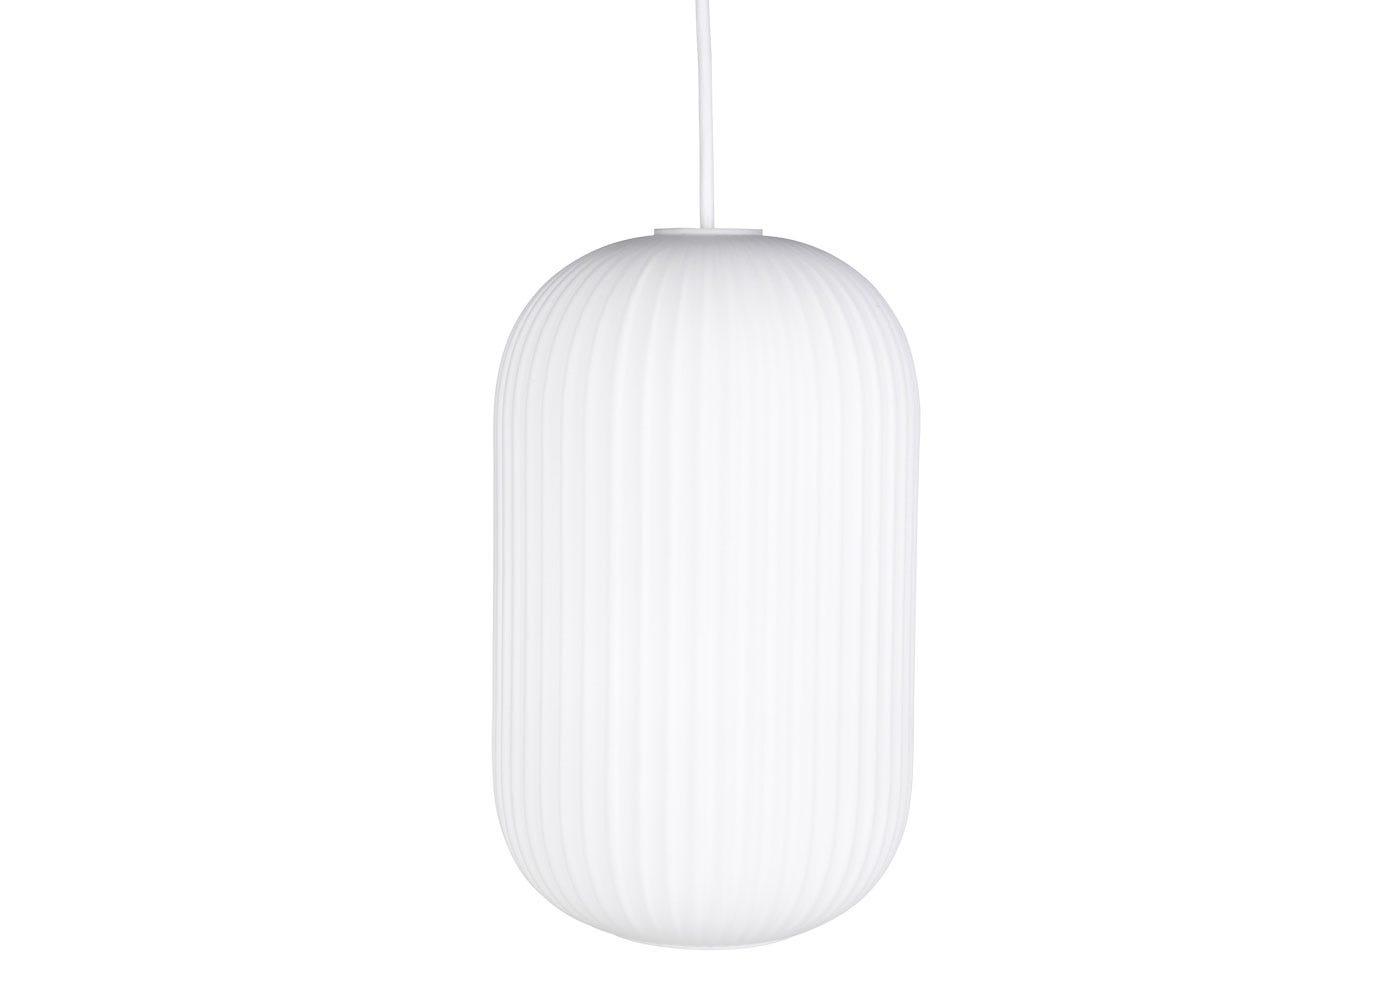 Opal Lantern Pendant Light Tall White - Off.